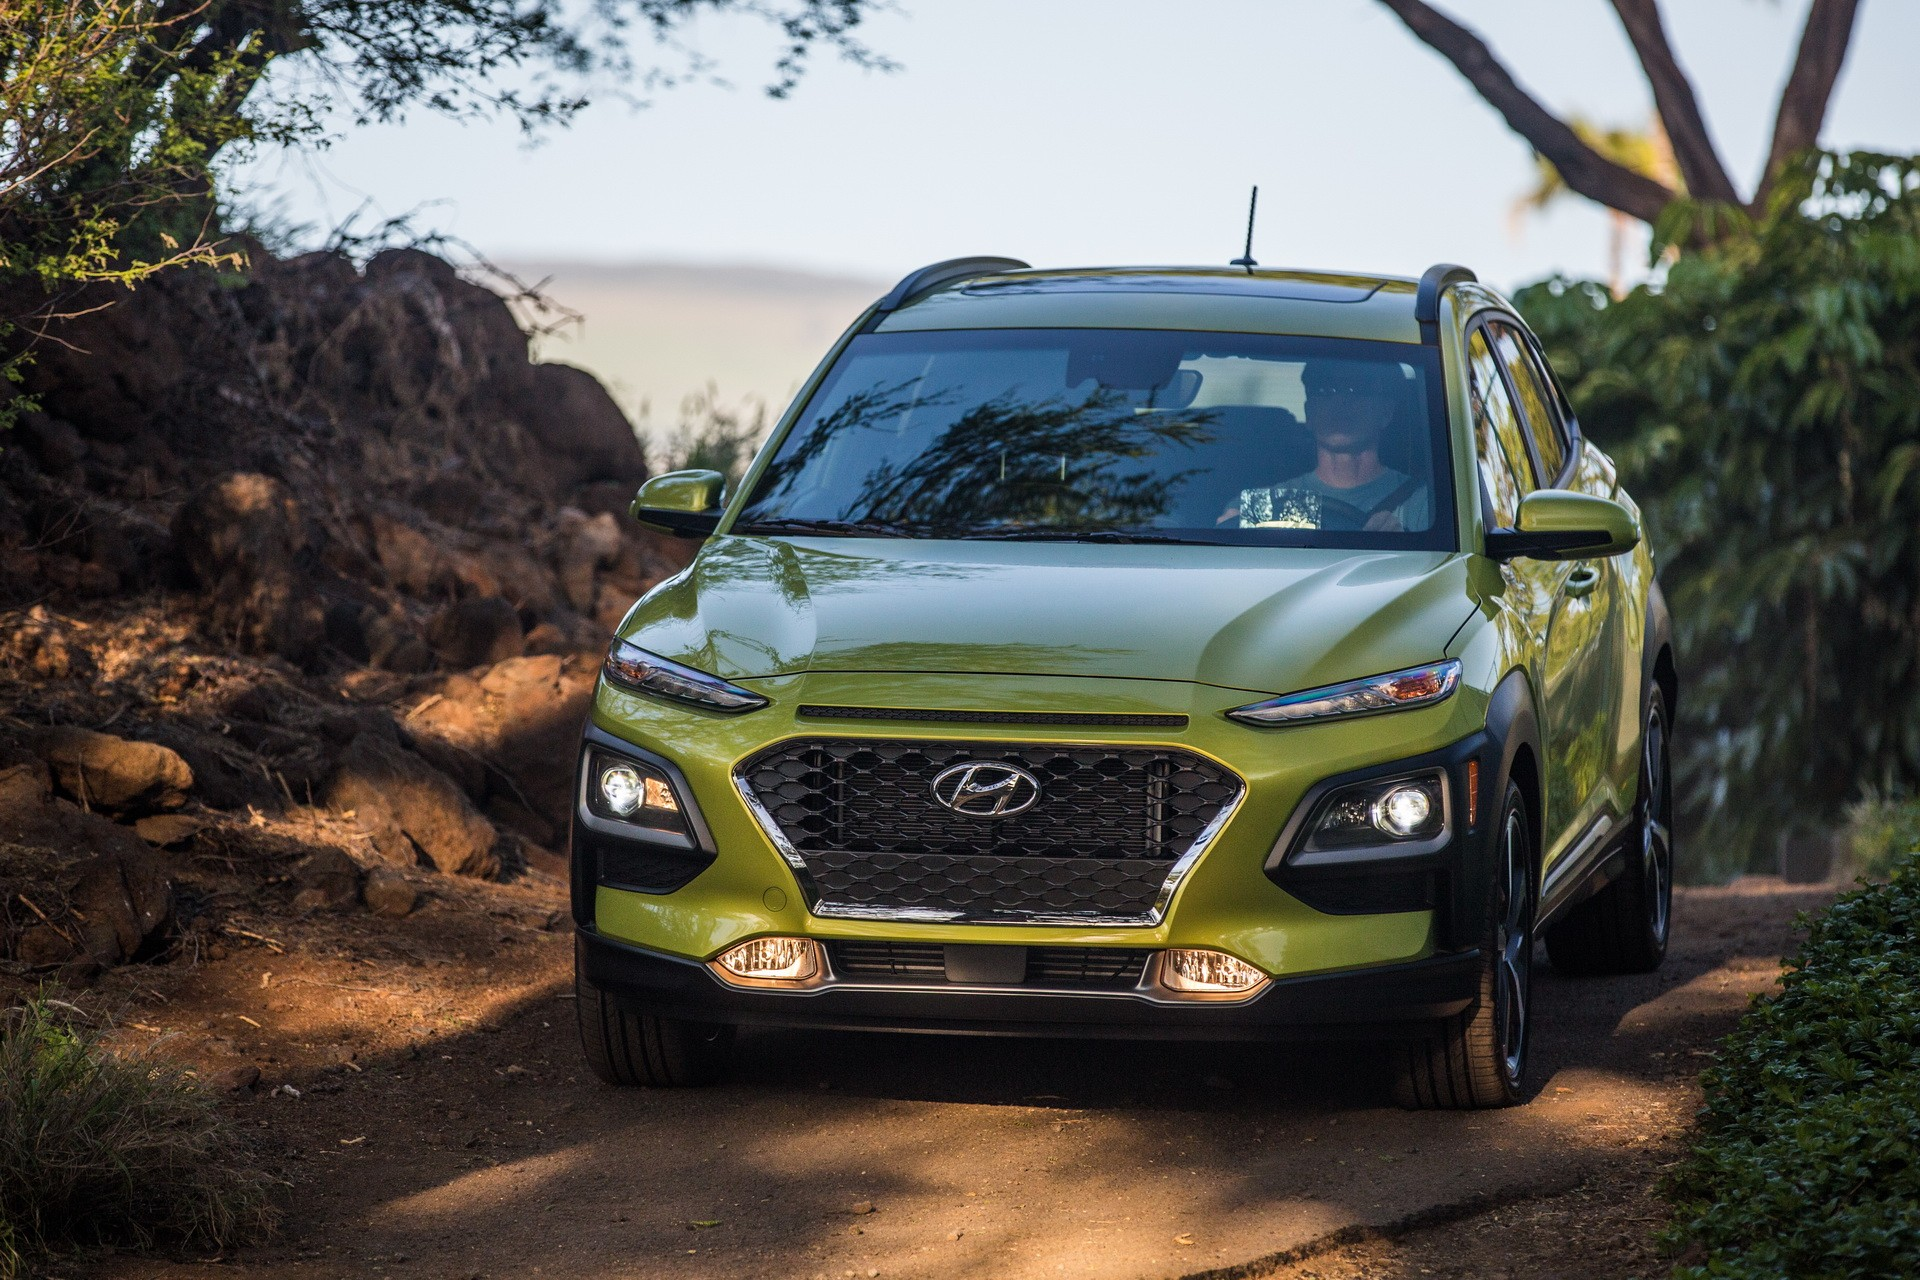 2018 Hyundai Kona U.S. Pricing Announced, Sounds Like a ...